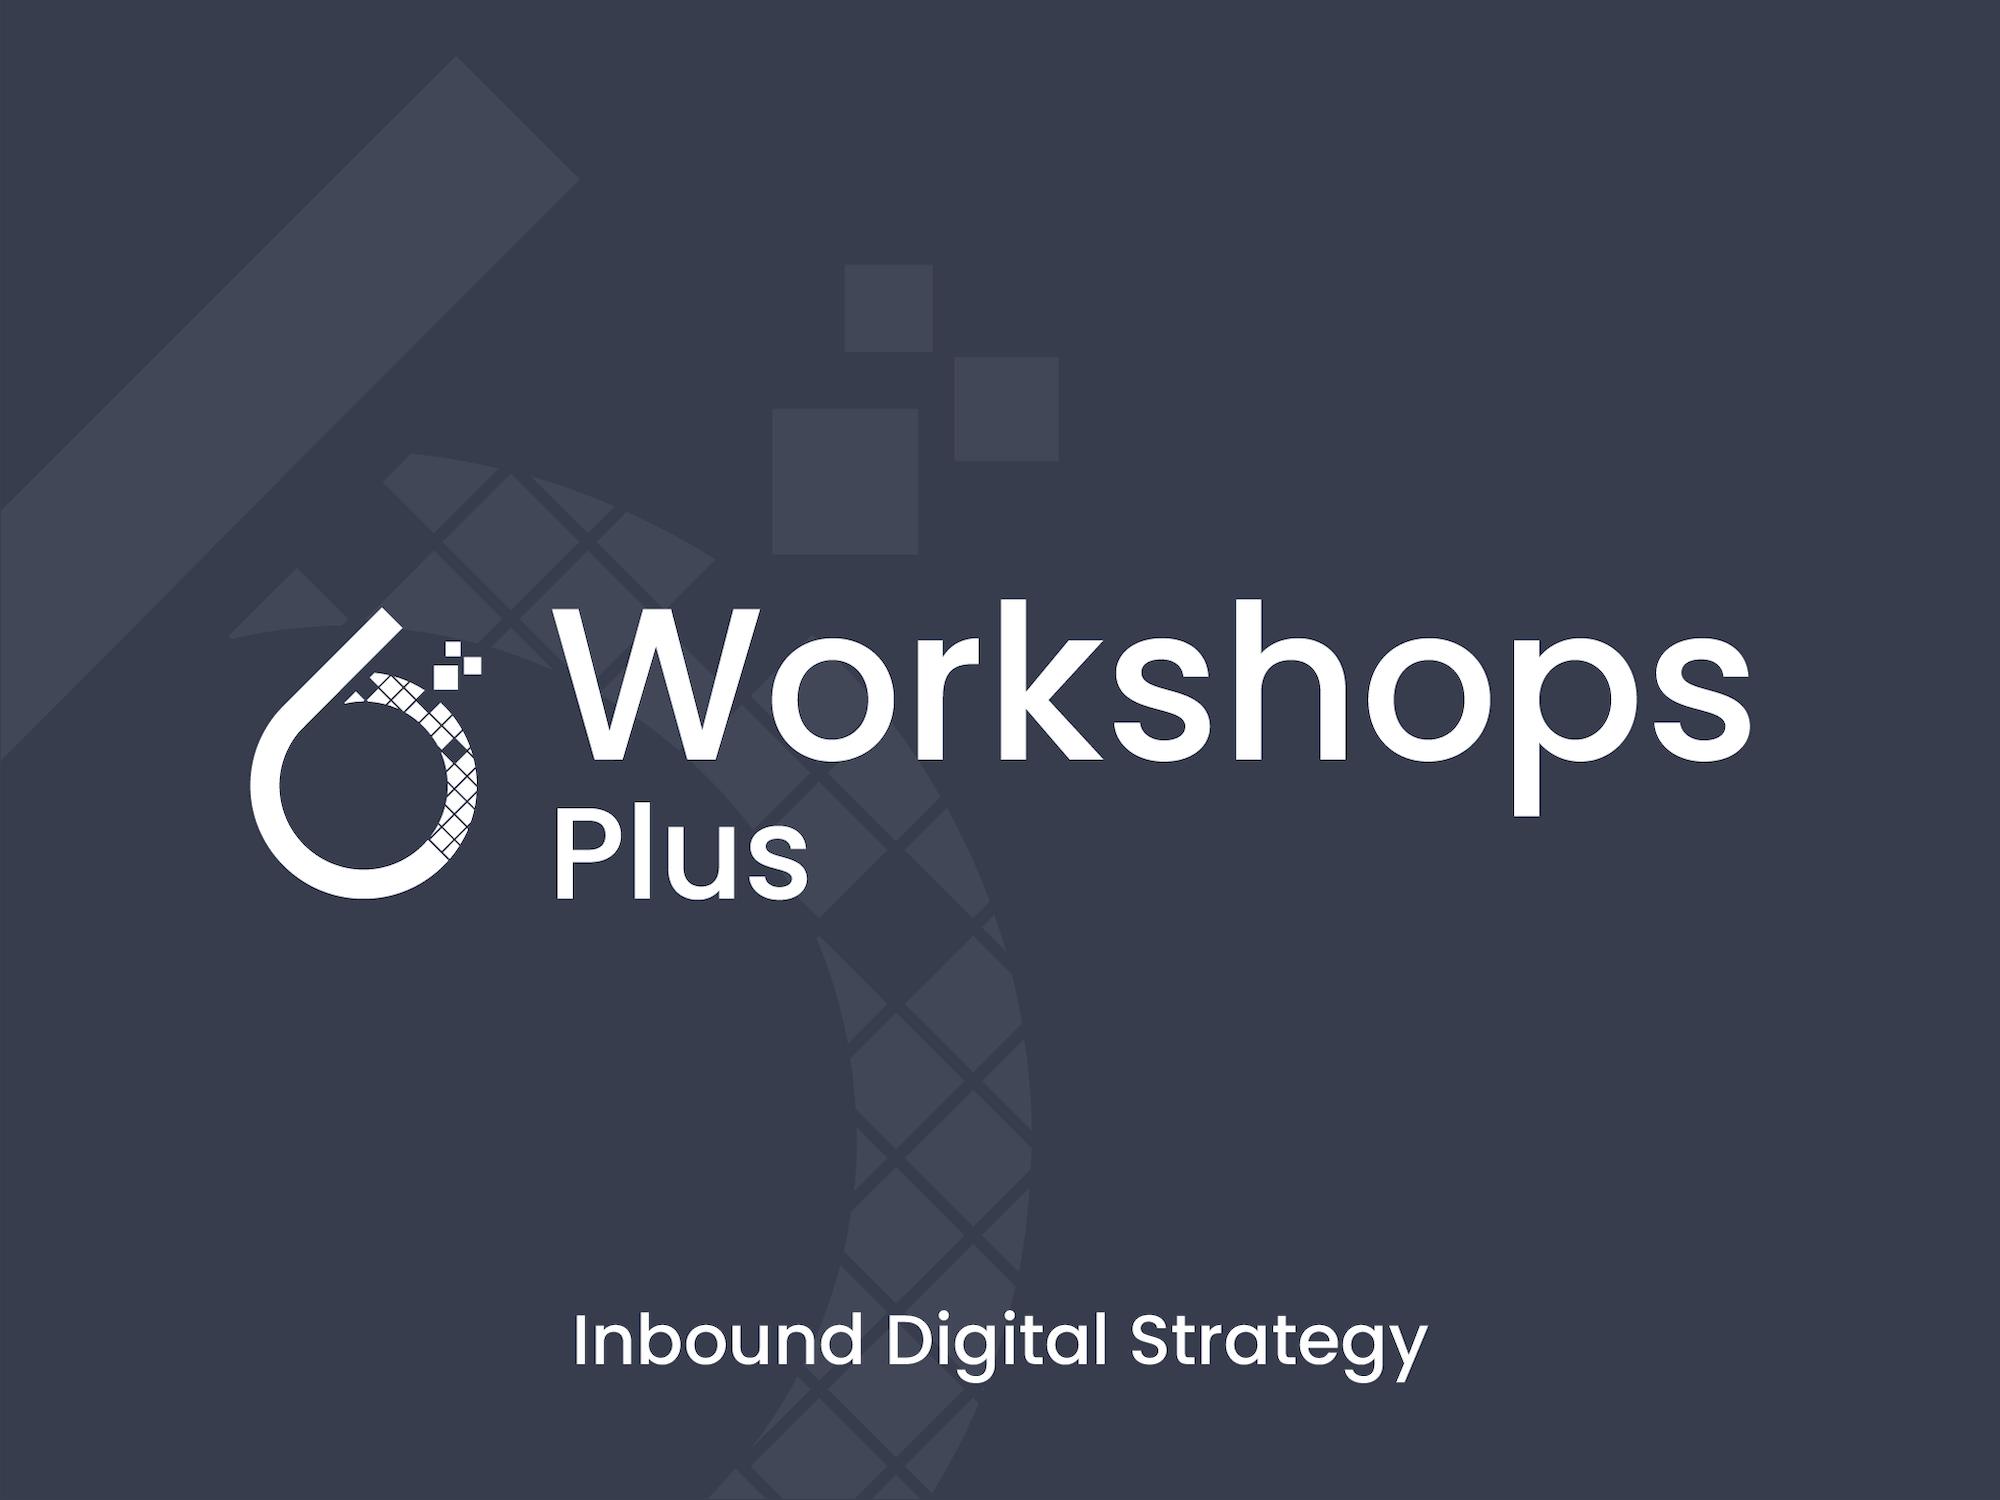 6teen30 - Growth Agency - Inbound Workshop Plus